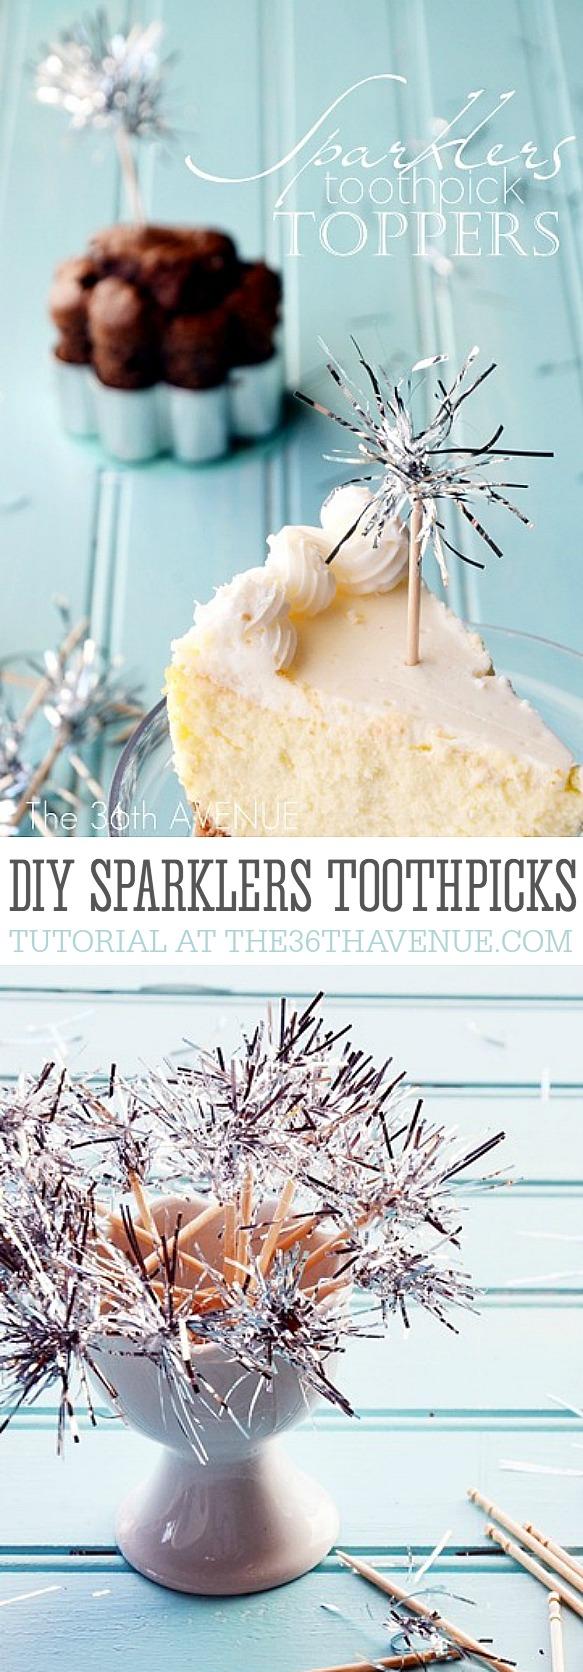 diy-sparklers-toothpicks-the36thavenue-com